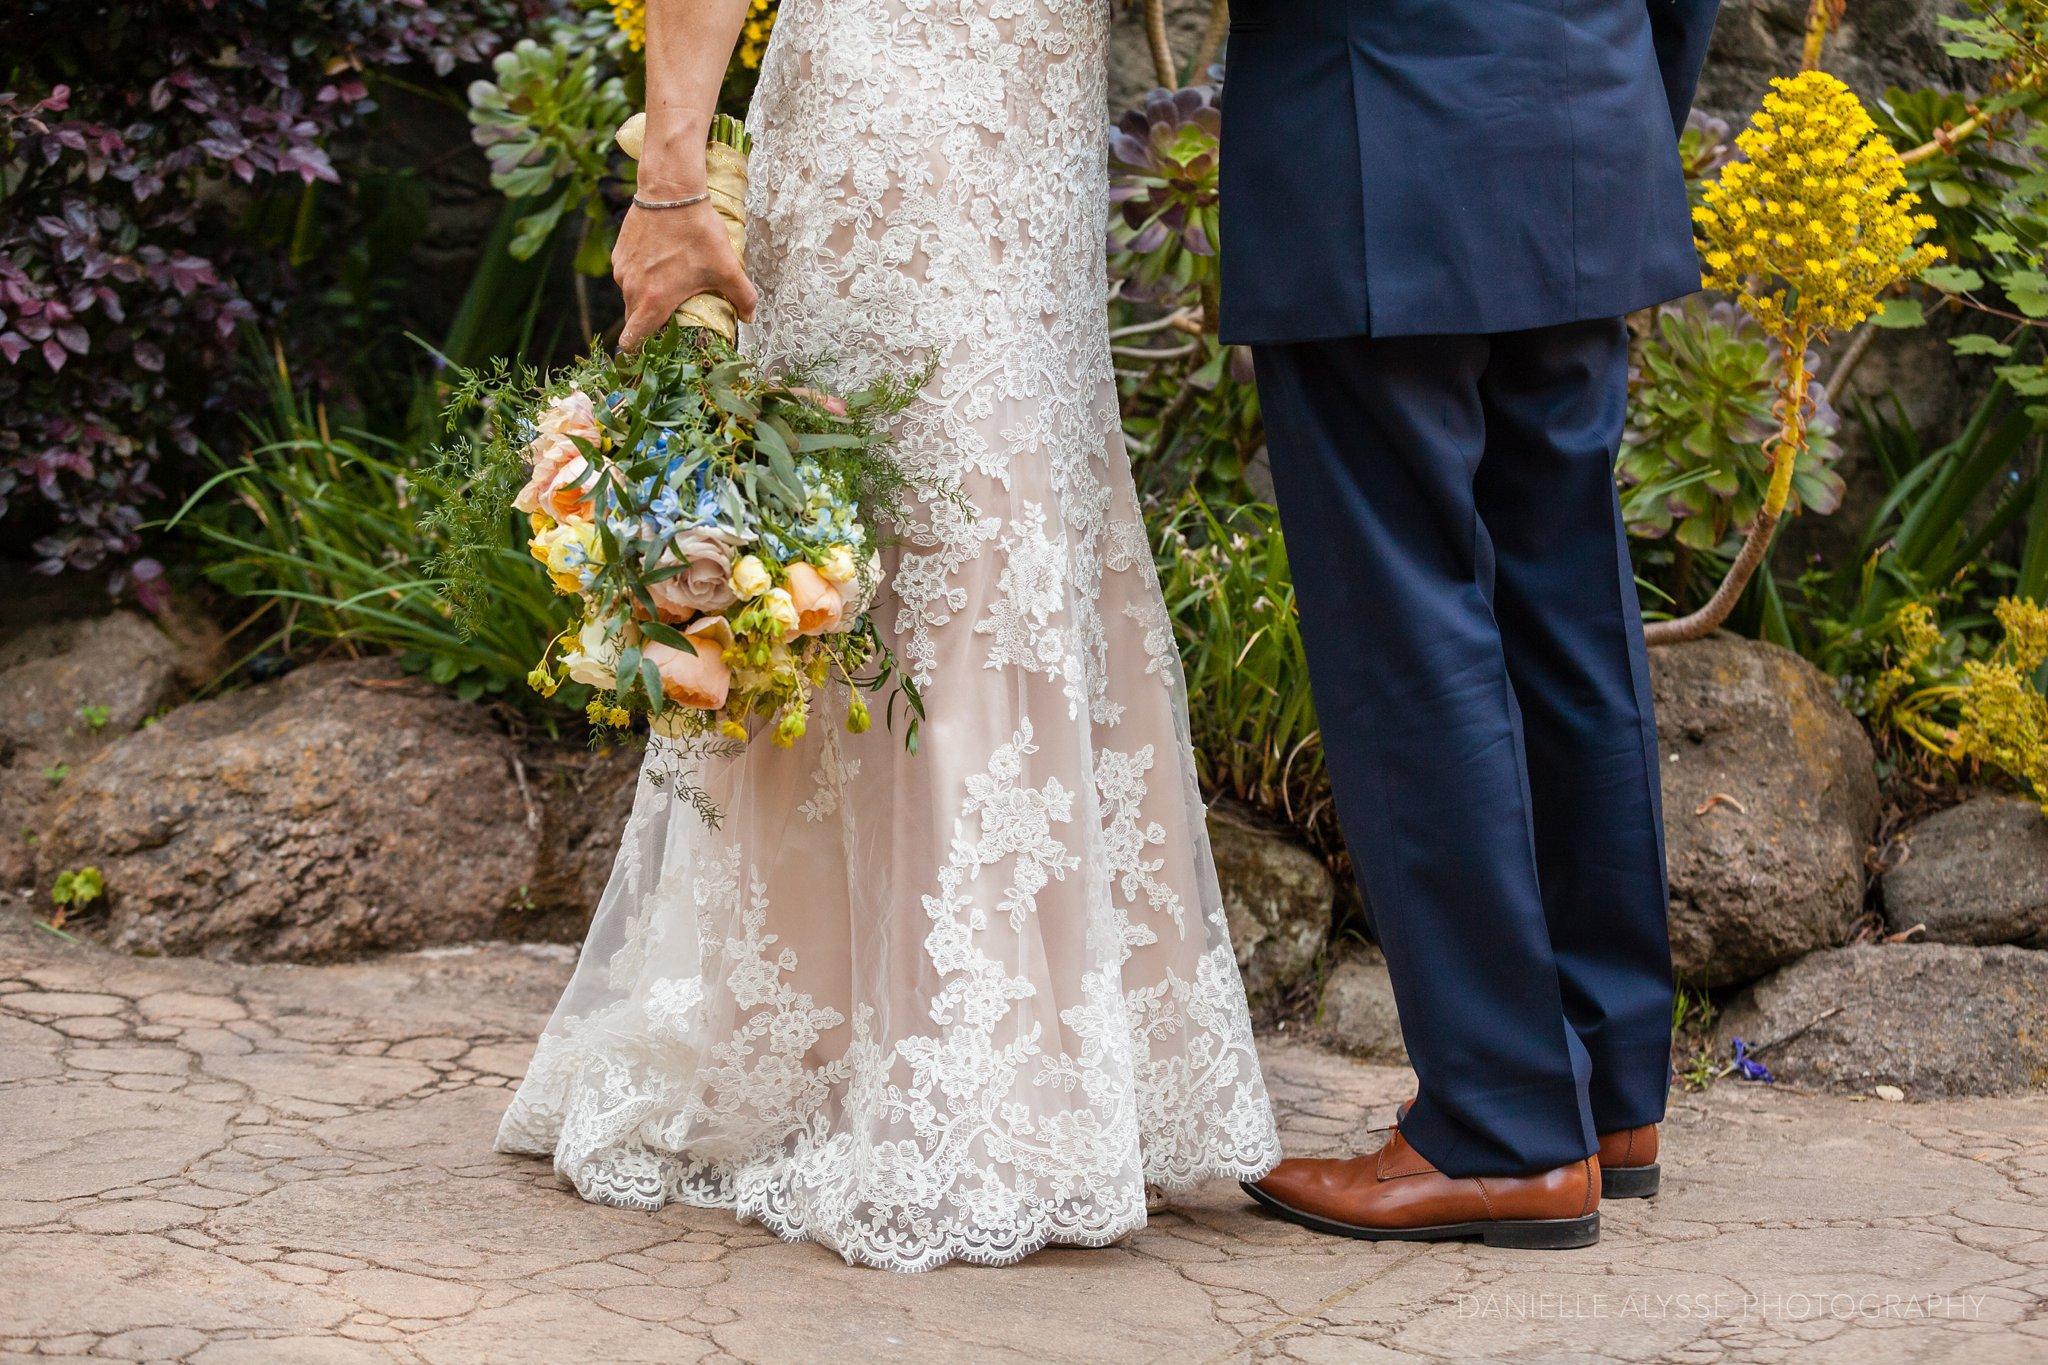 170429_blog_kimberly_ben_wedding_san_mateo_curiodyssey_danielle_alysse_photography_sacramento_photographer0406_WEB.jpg